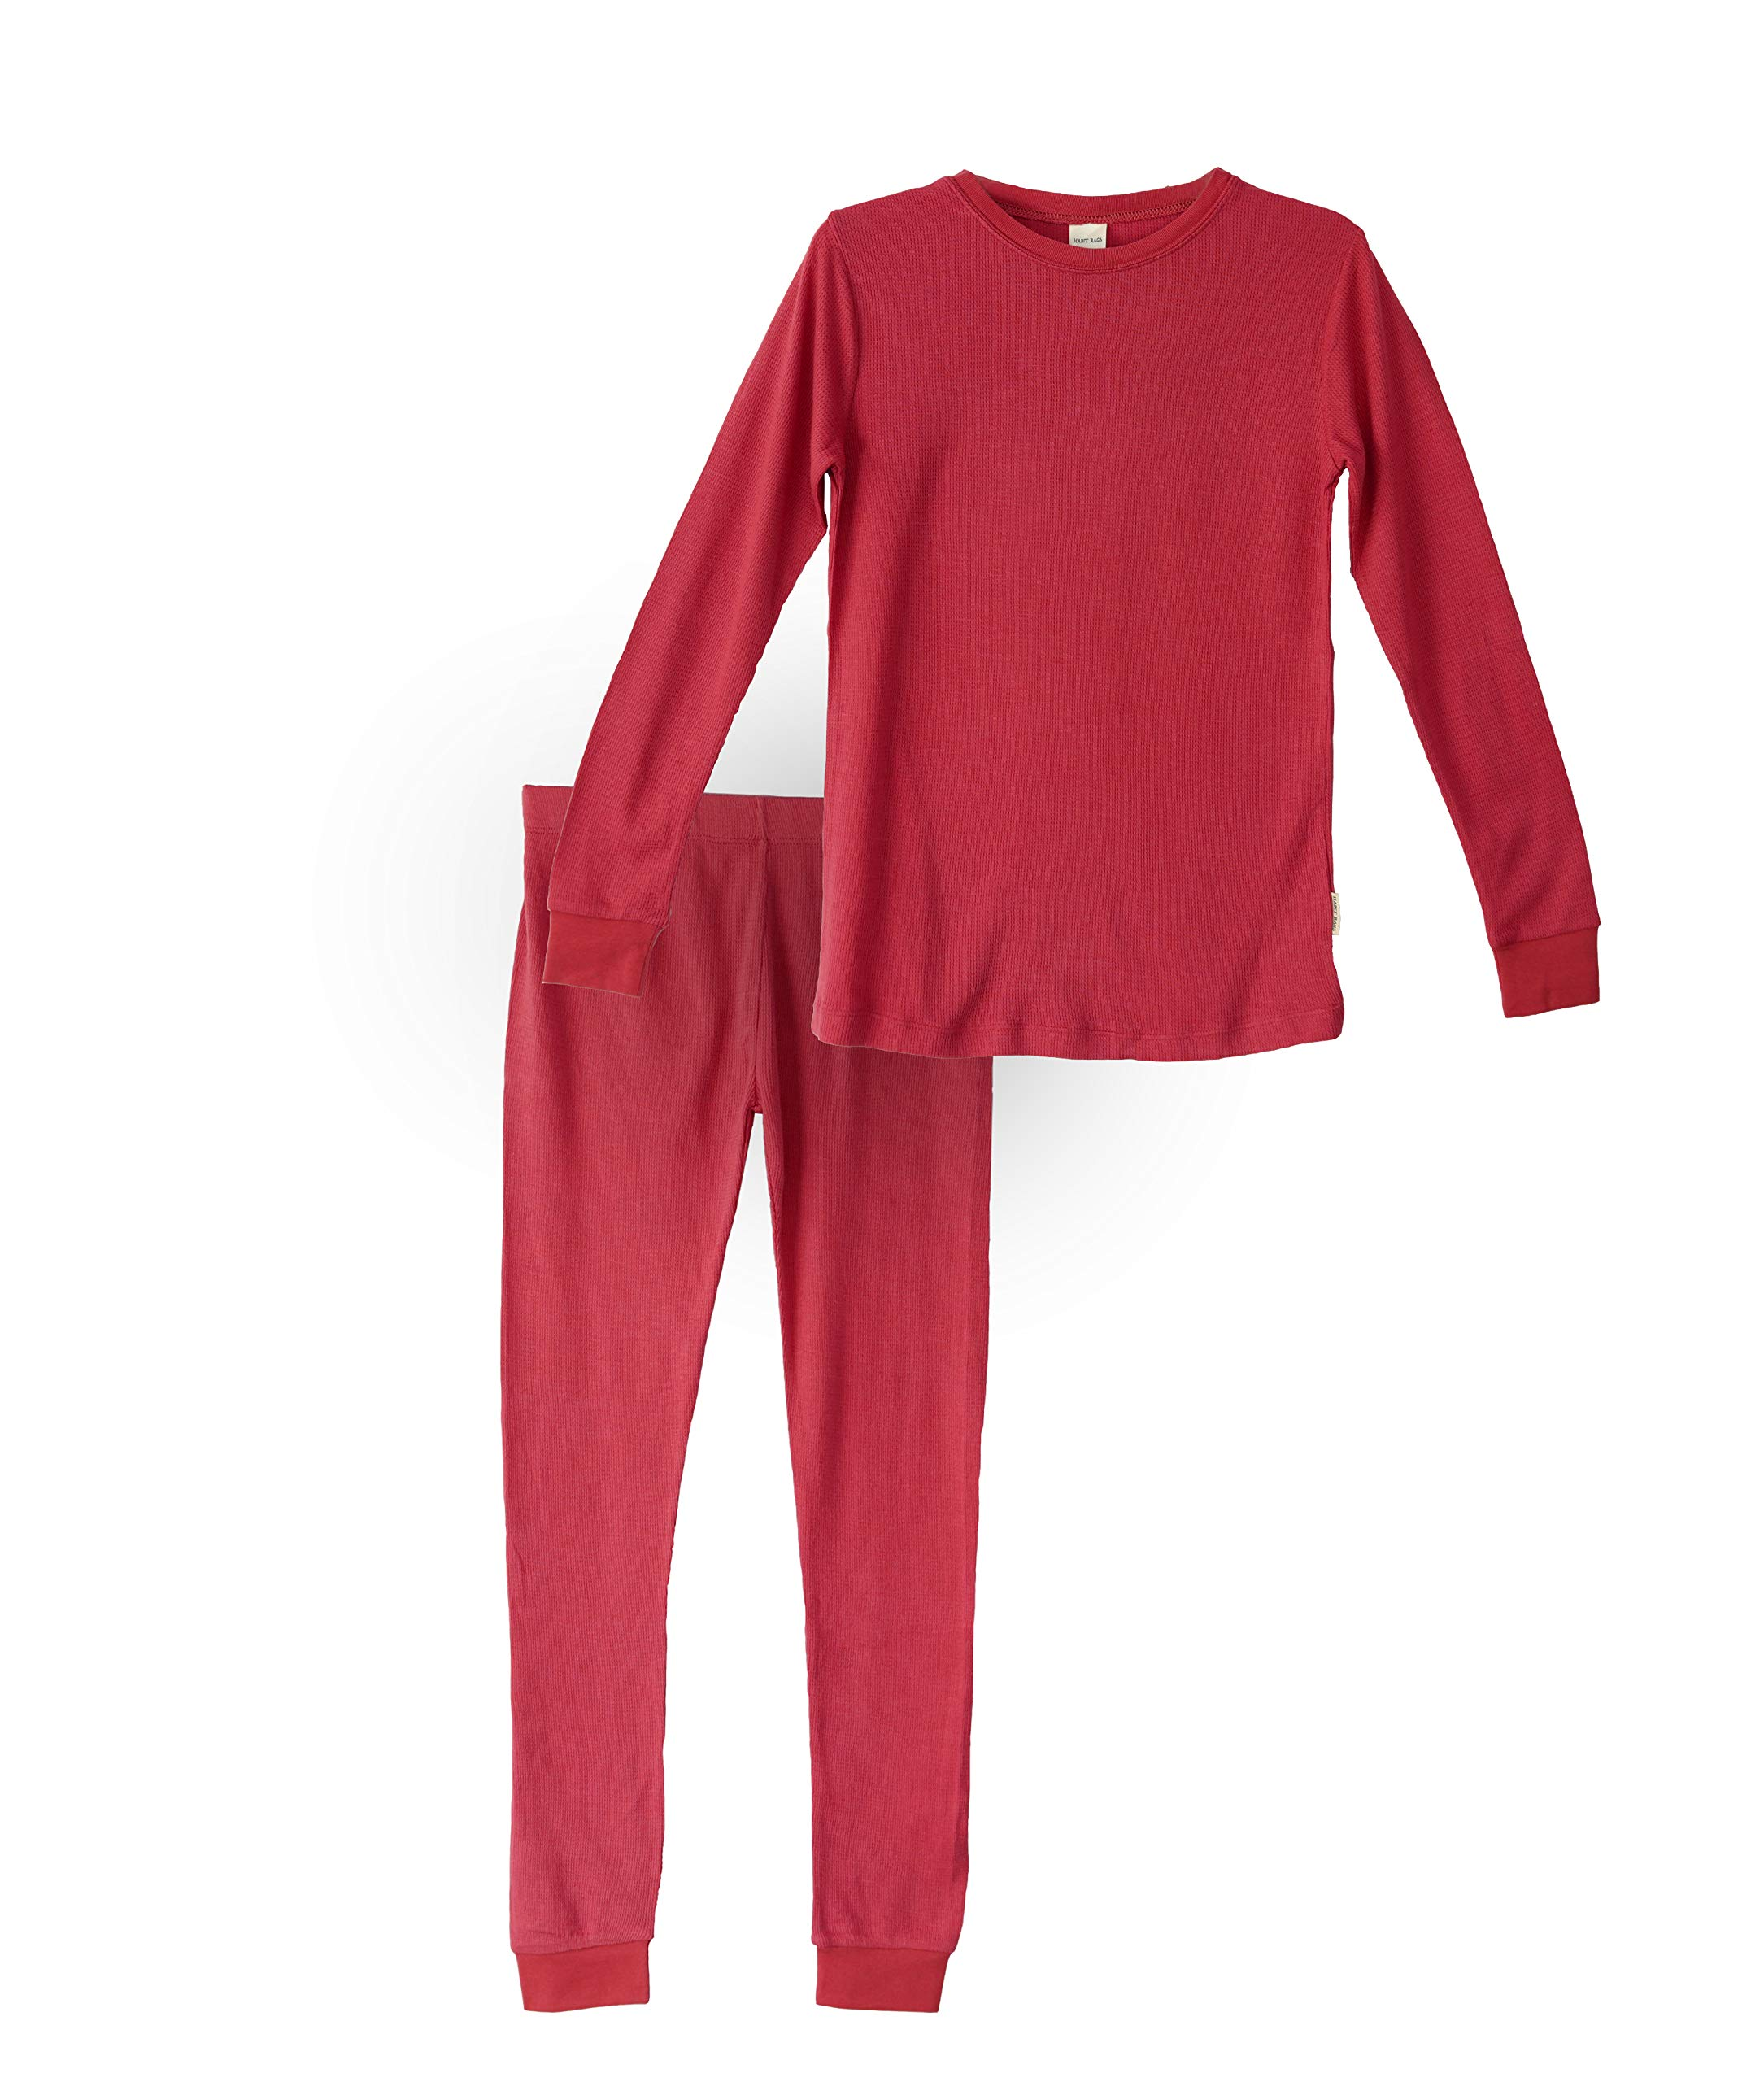 Habit Rags -- Boys Girls Organic Bamboo Two Piece Thermal Underwear Long John Pajama Set Toddlers Big Kids (5, Fire Red)